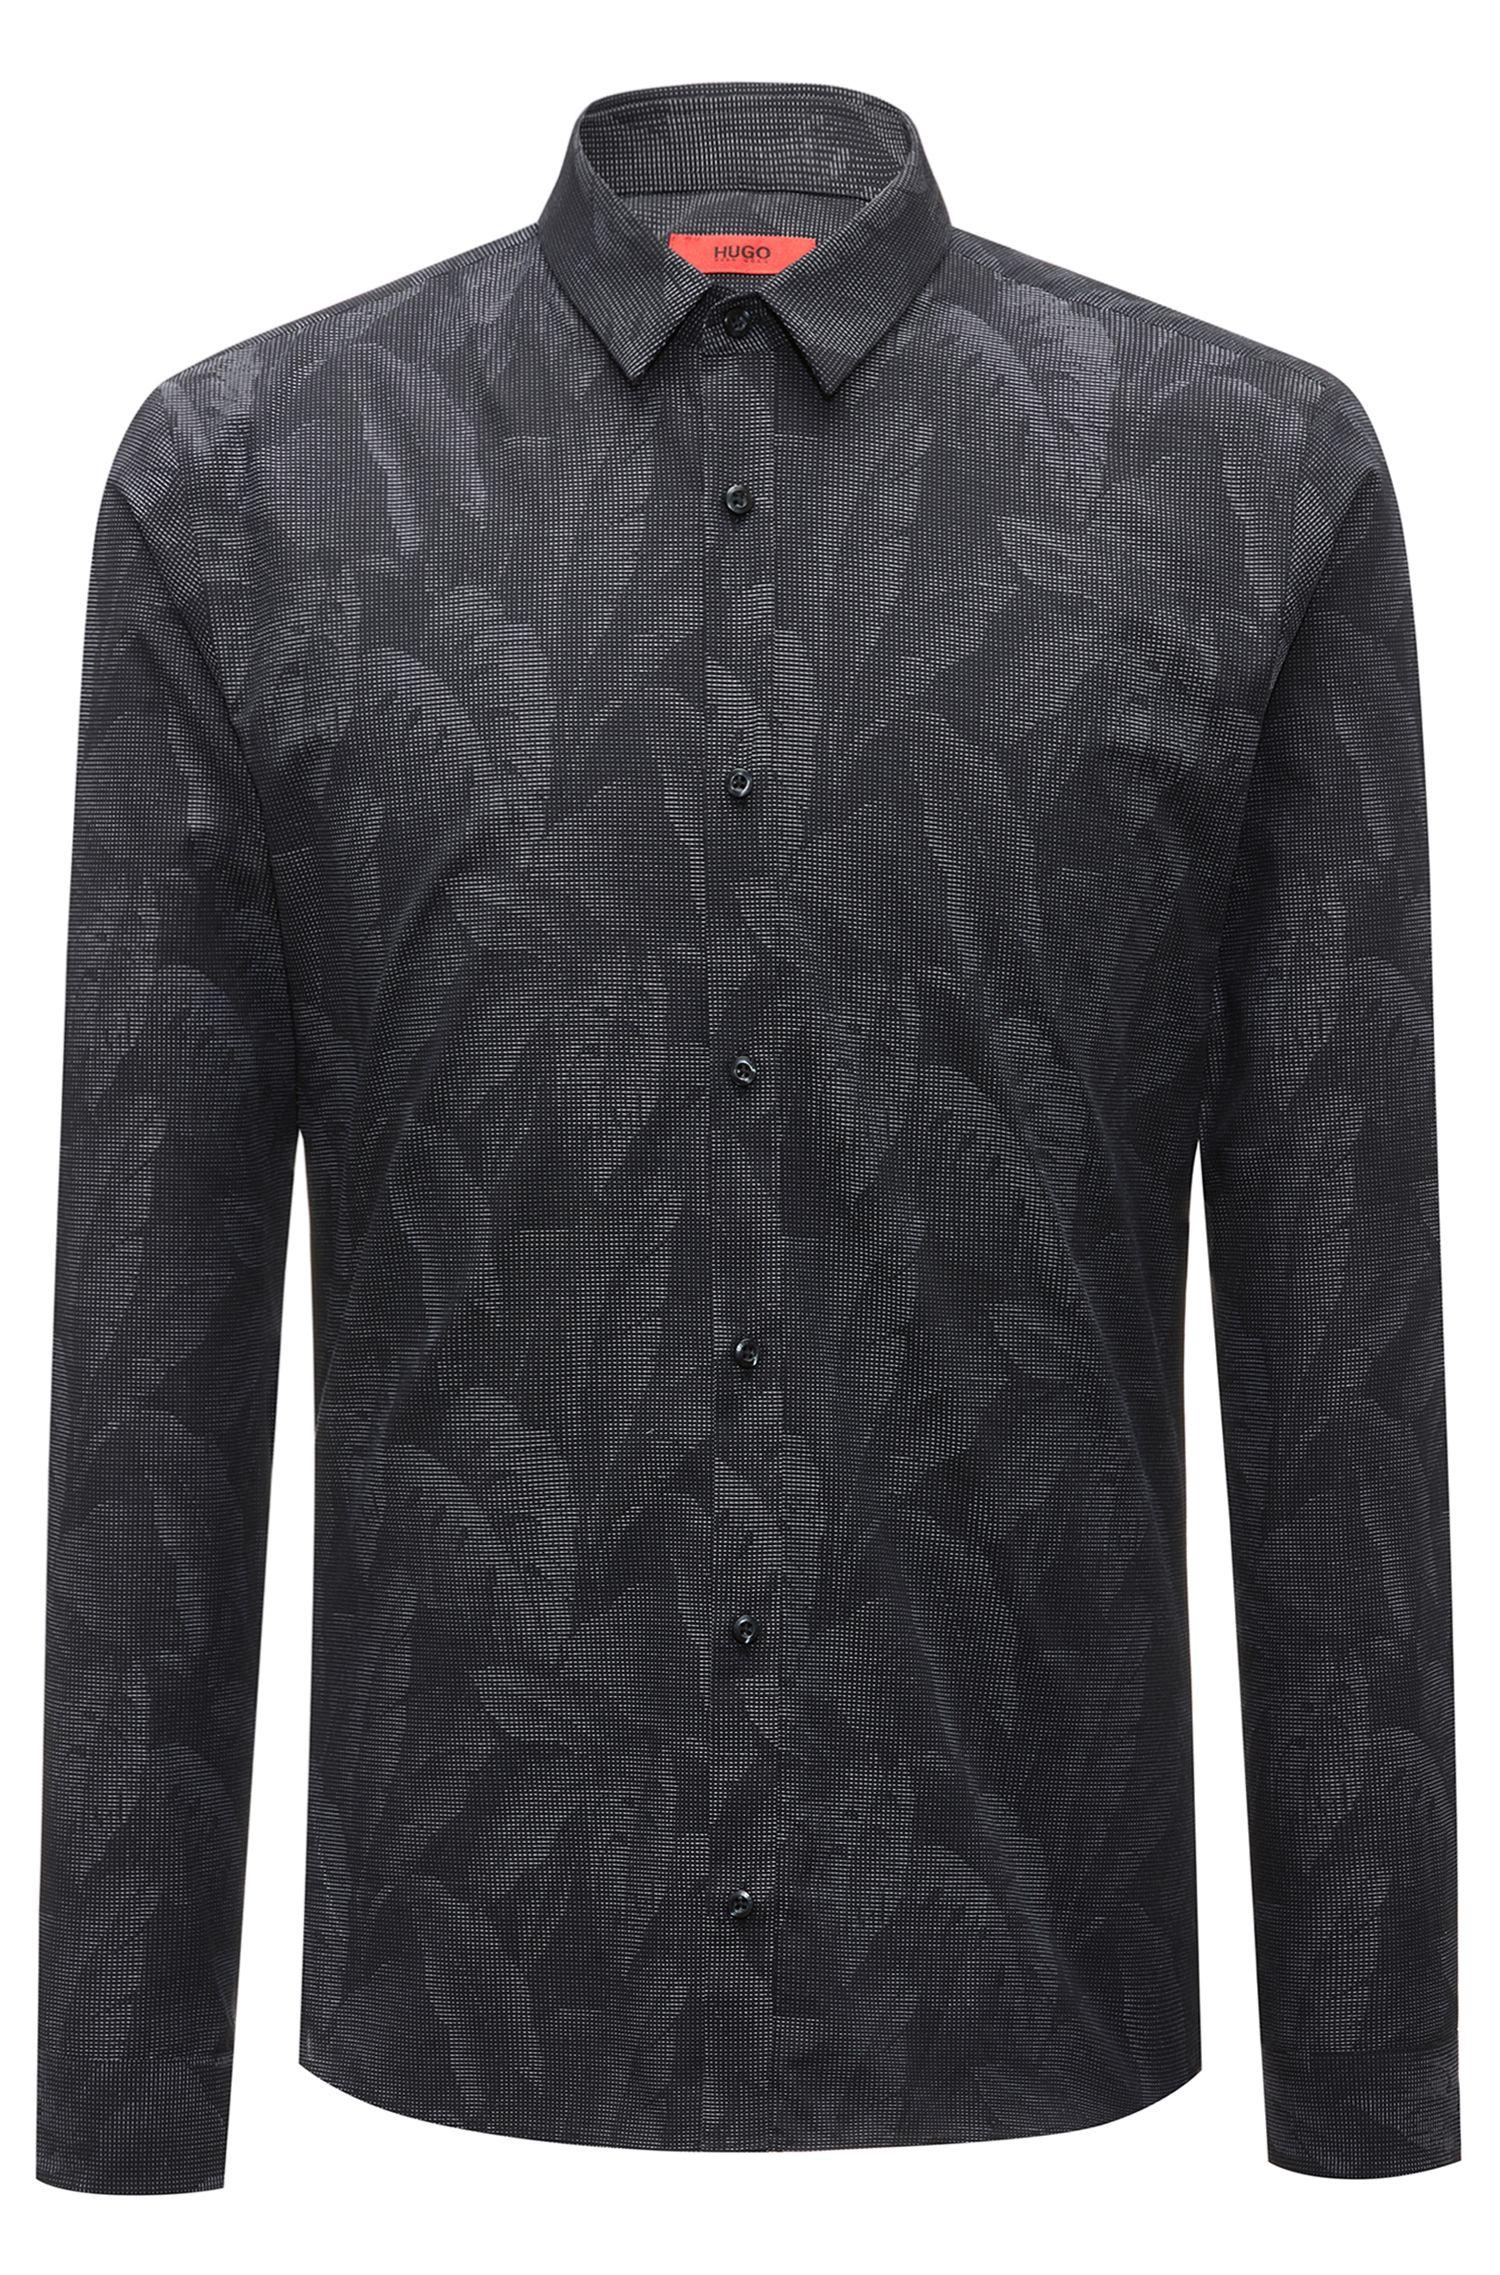 Slim-fit cotton shirt with jacquard banana-leaf pattern